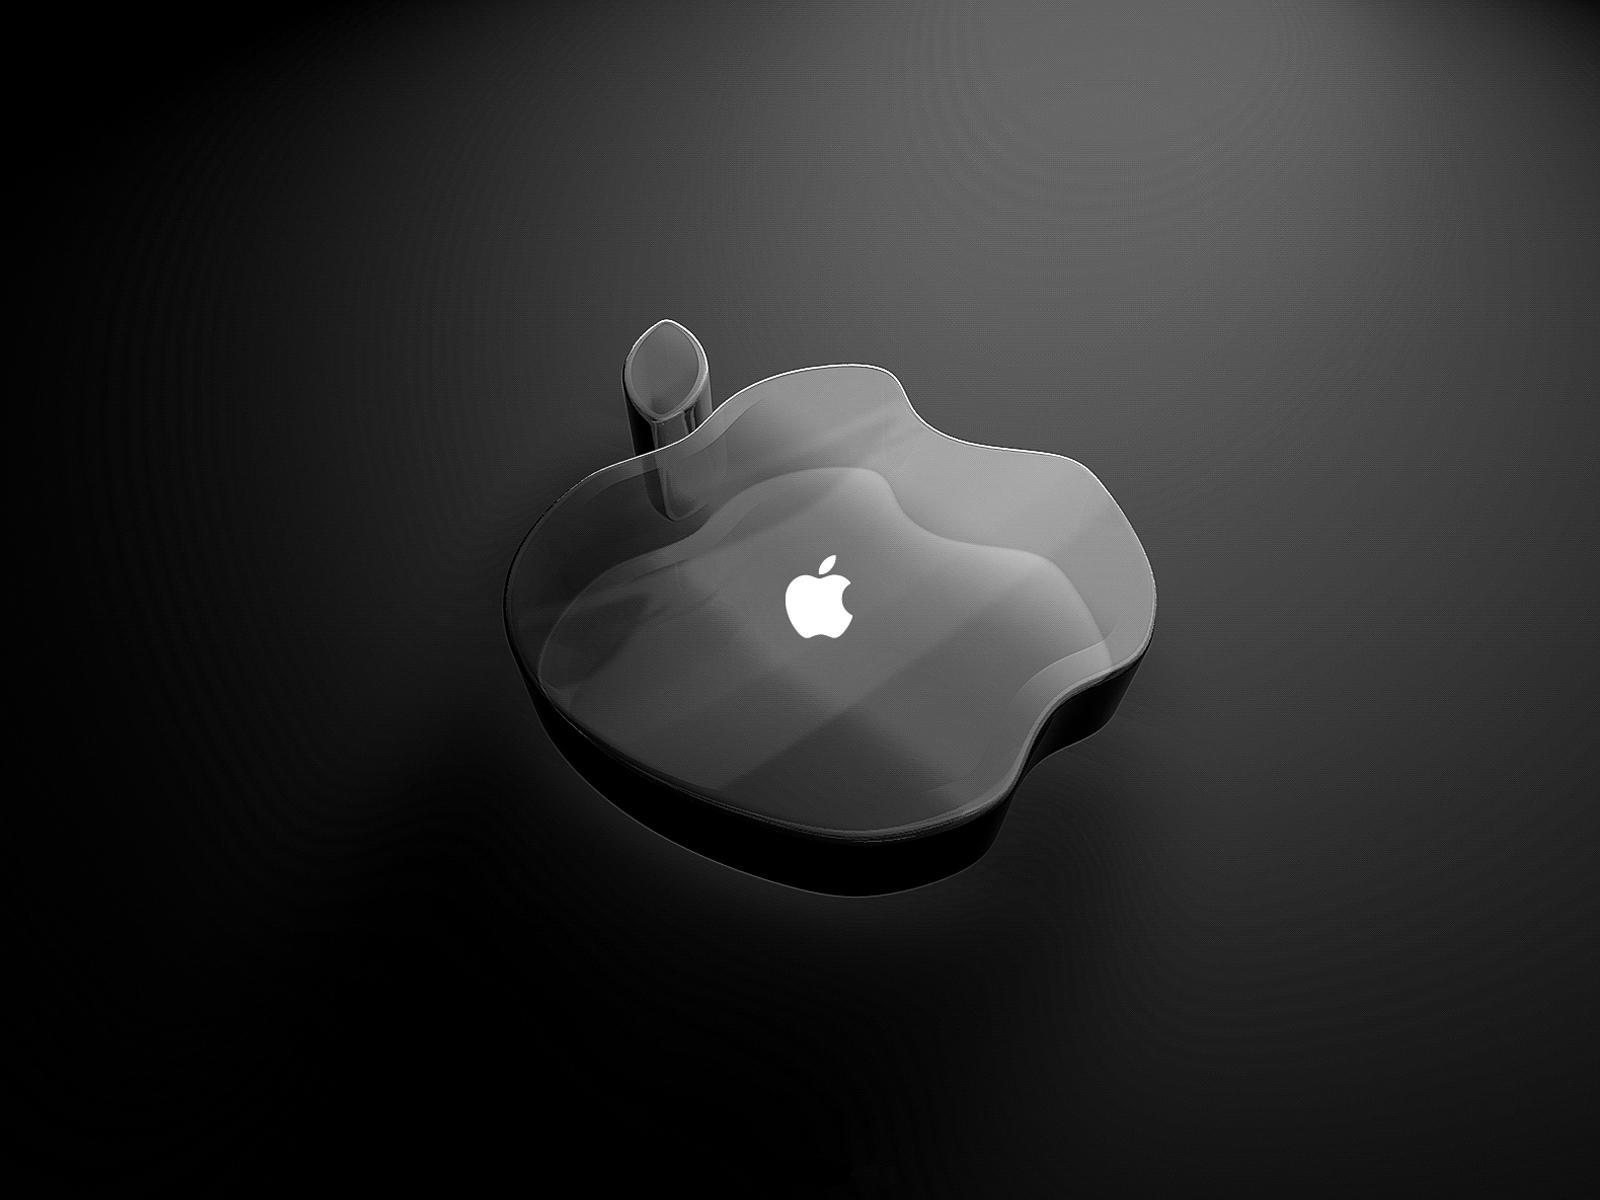 Apple 3D Wallpapers HD 1600x1200